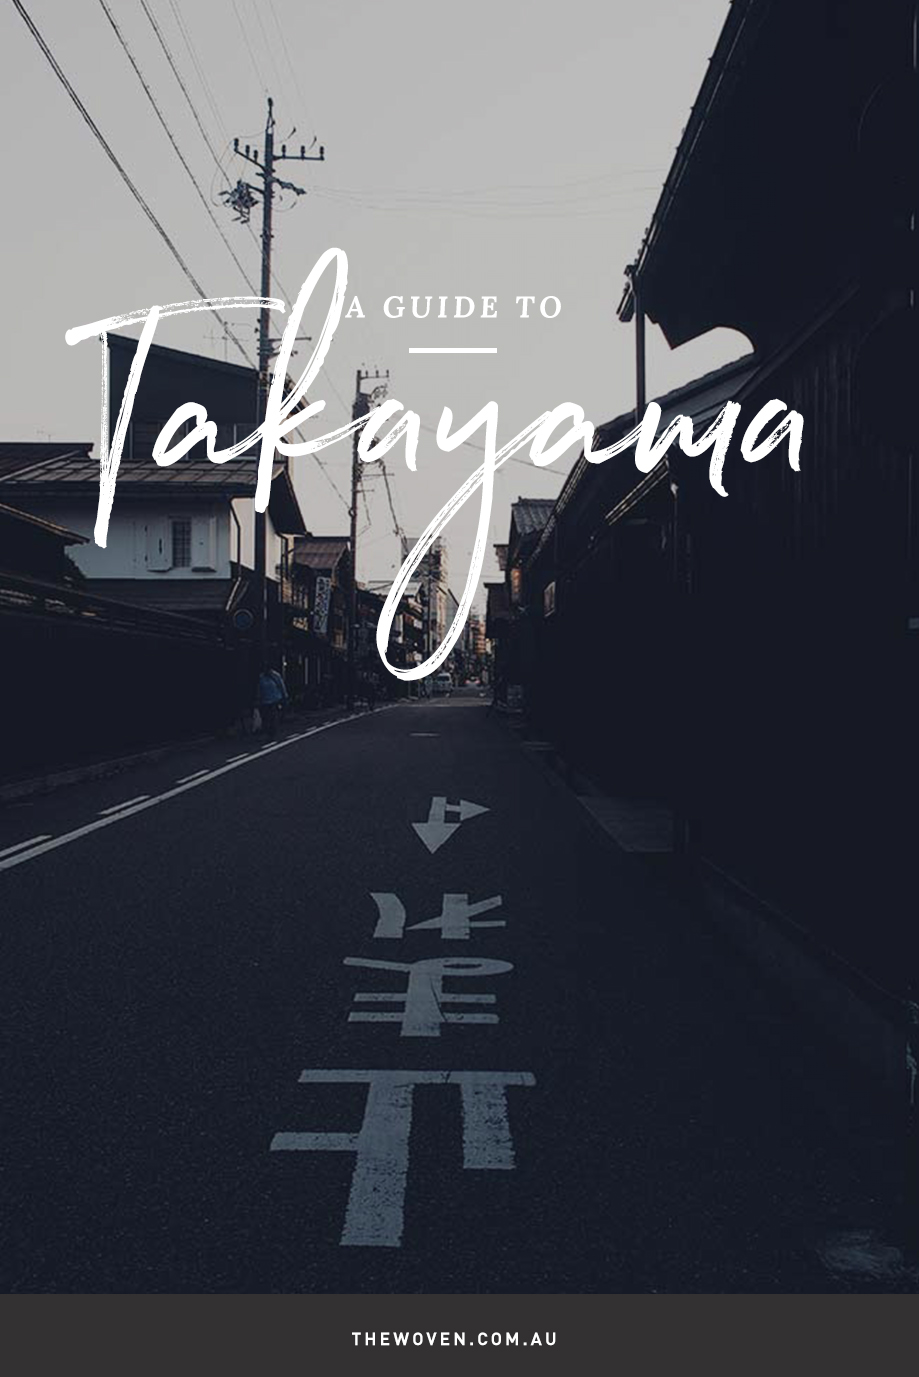 A guide to Takayama, Japan